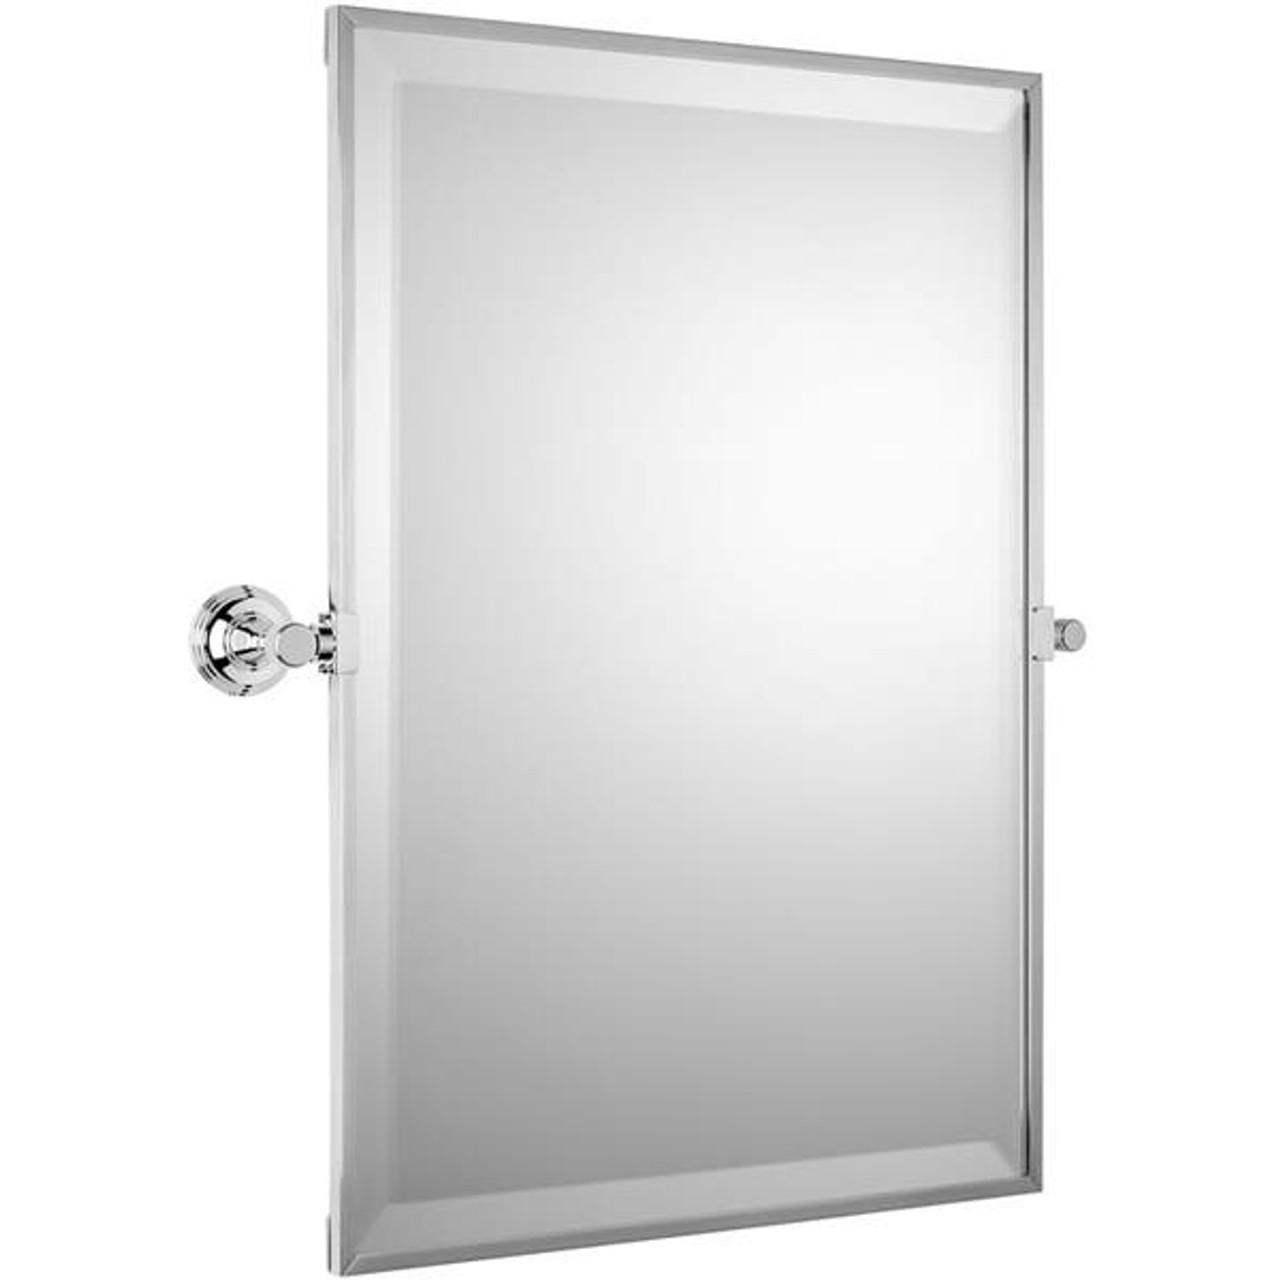 Chrome Plated Samuel Heath Style Moderne Framed Mirror L6743-C